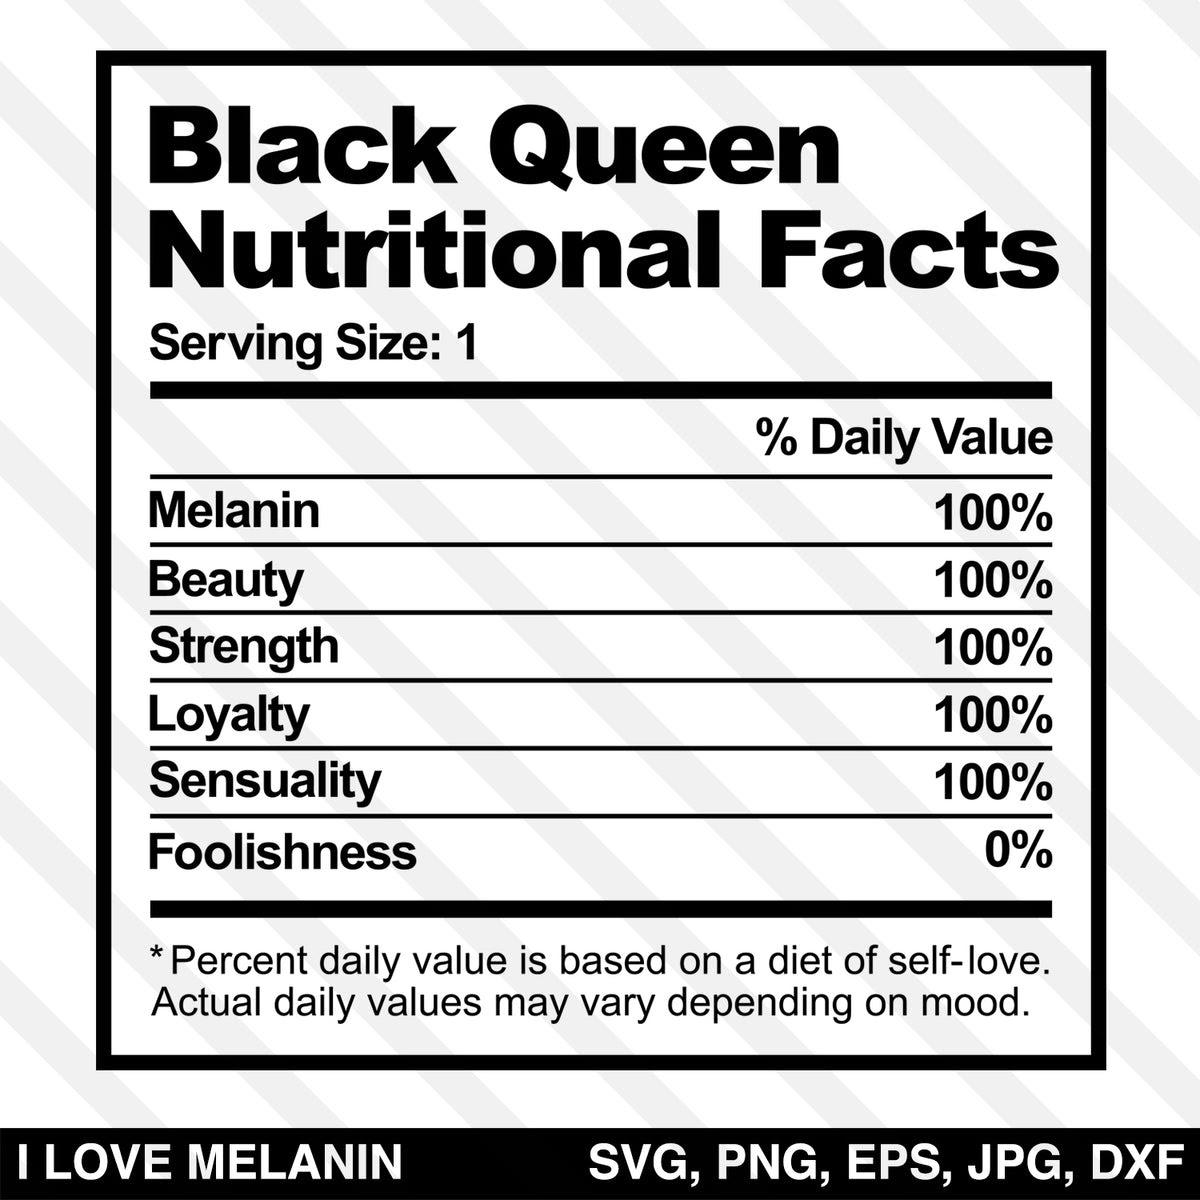 Download Black Queen Nutritional Facts SVG - I Love Melanin